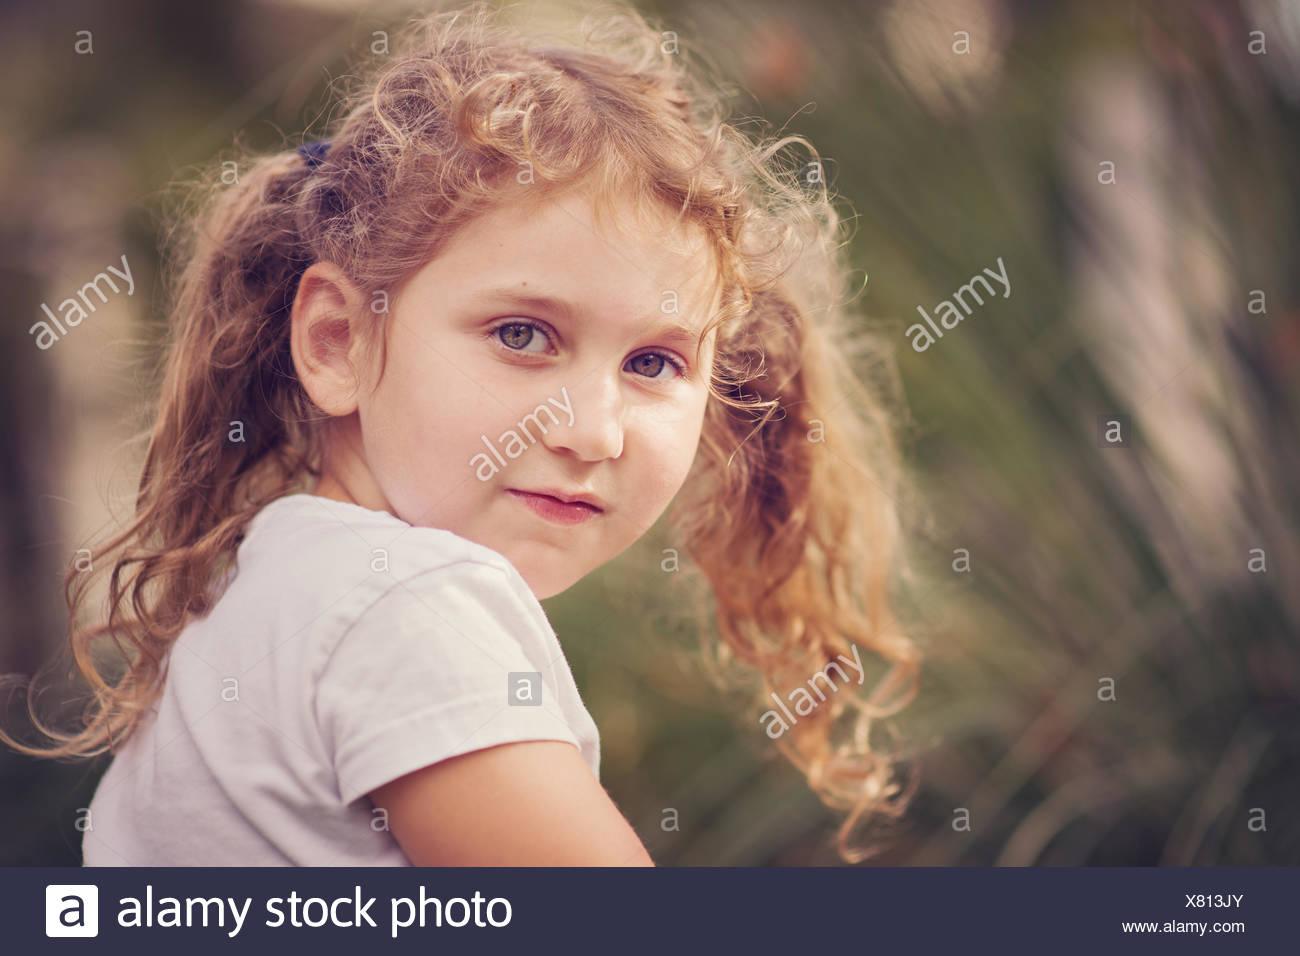 Girl looking over her shoulder - Stock Image